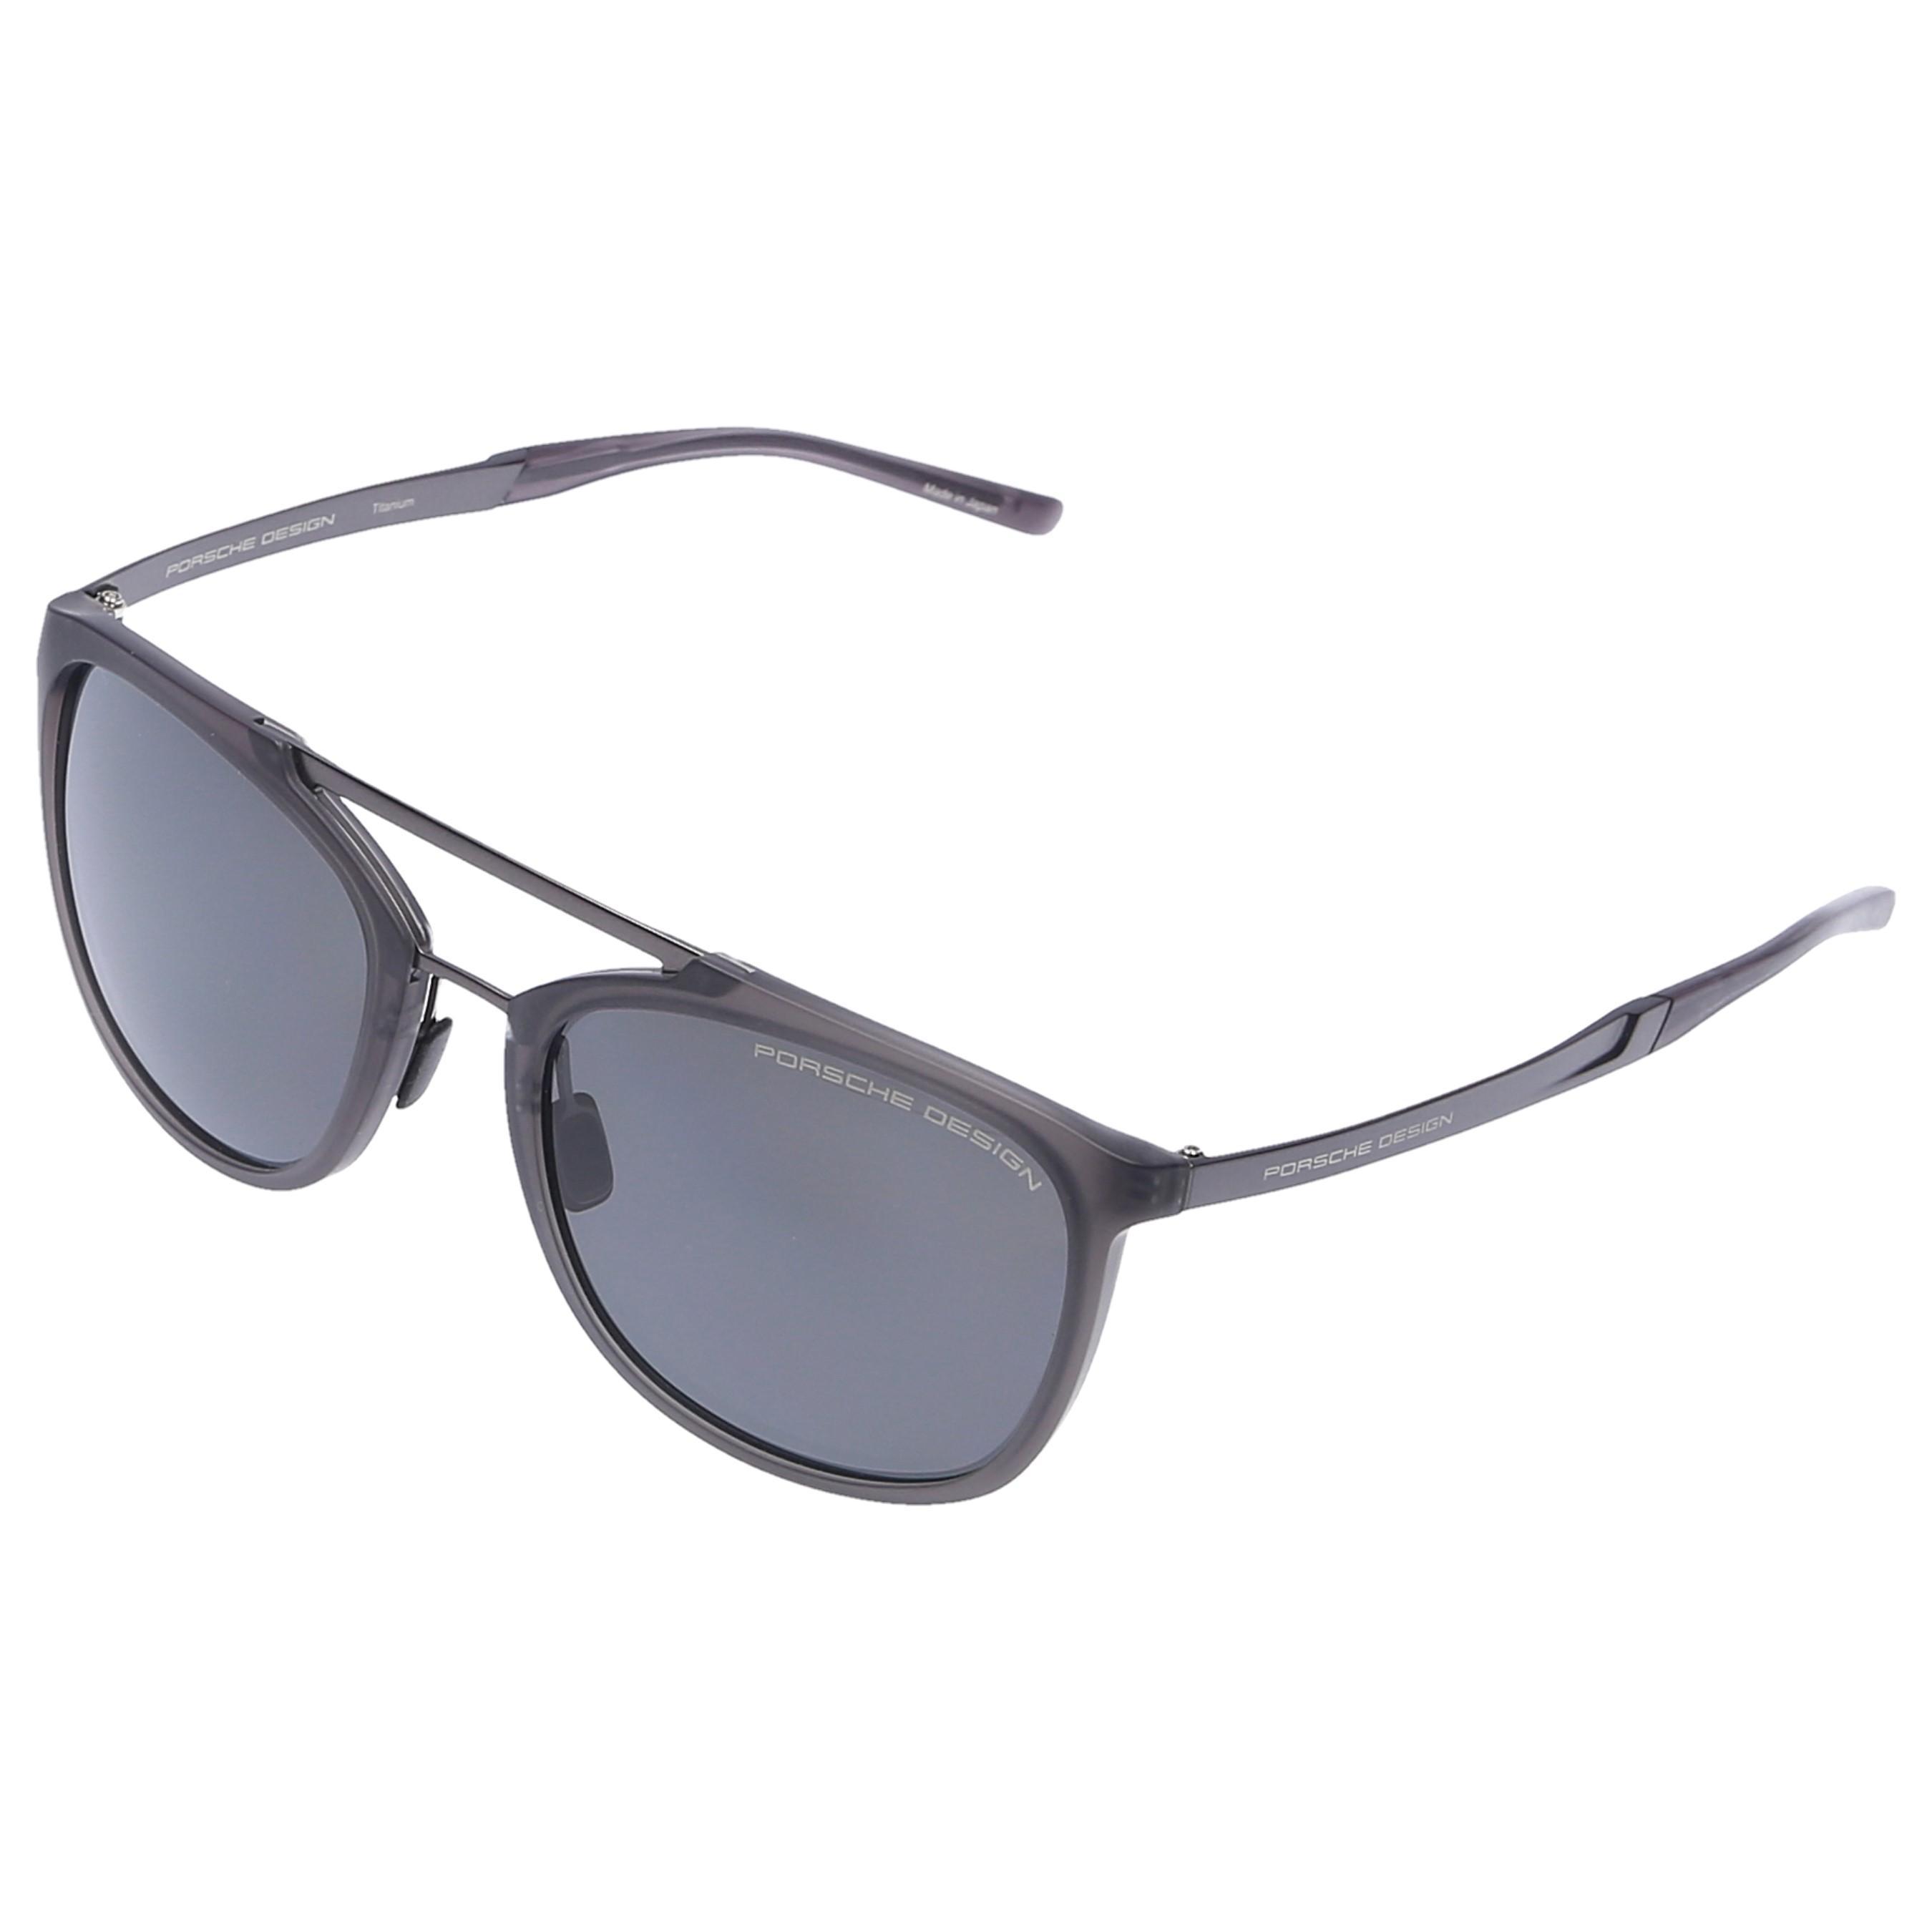 32e4423741 Lyst - Porsche Design Men Sunglasses D-frame 8671 Acetate Titanium ...